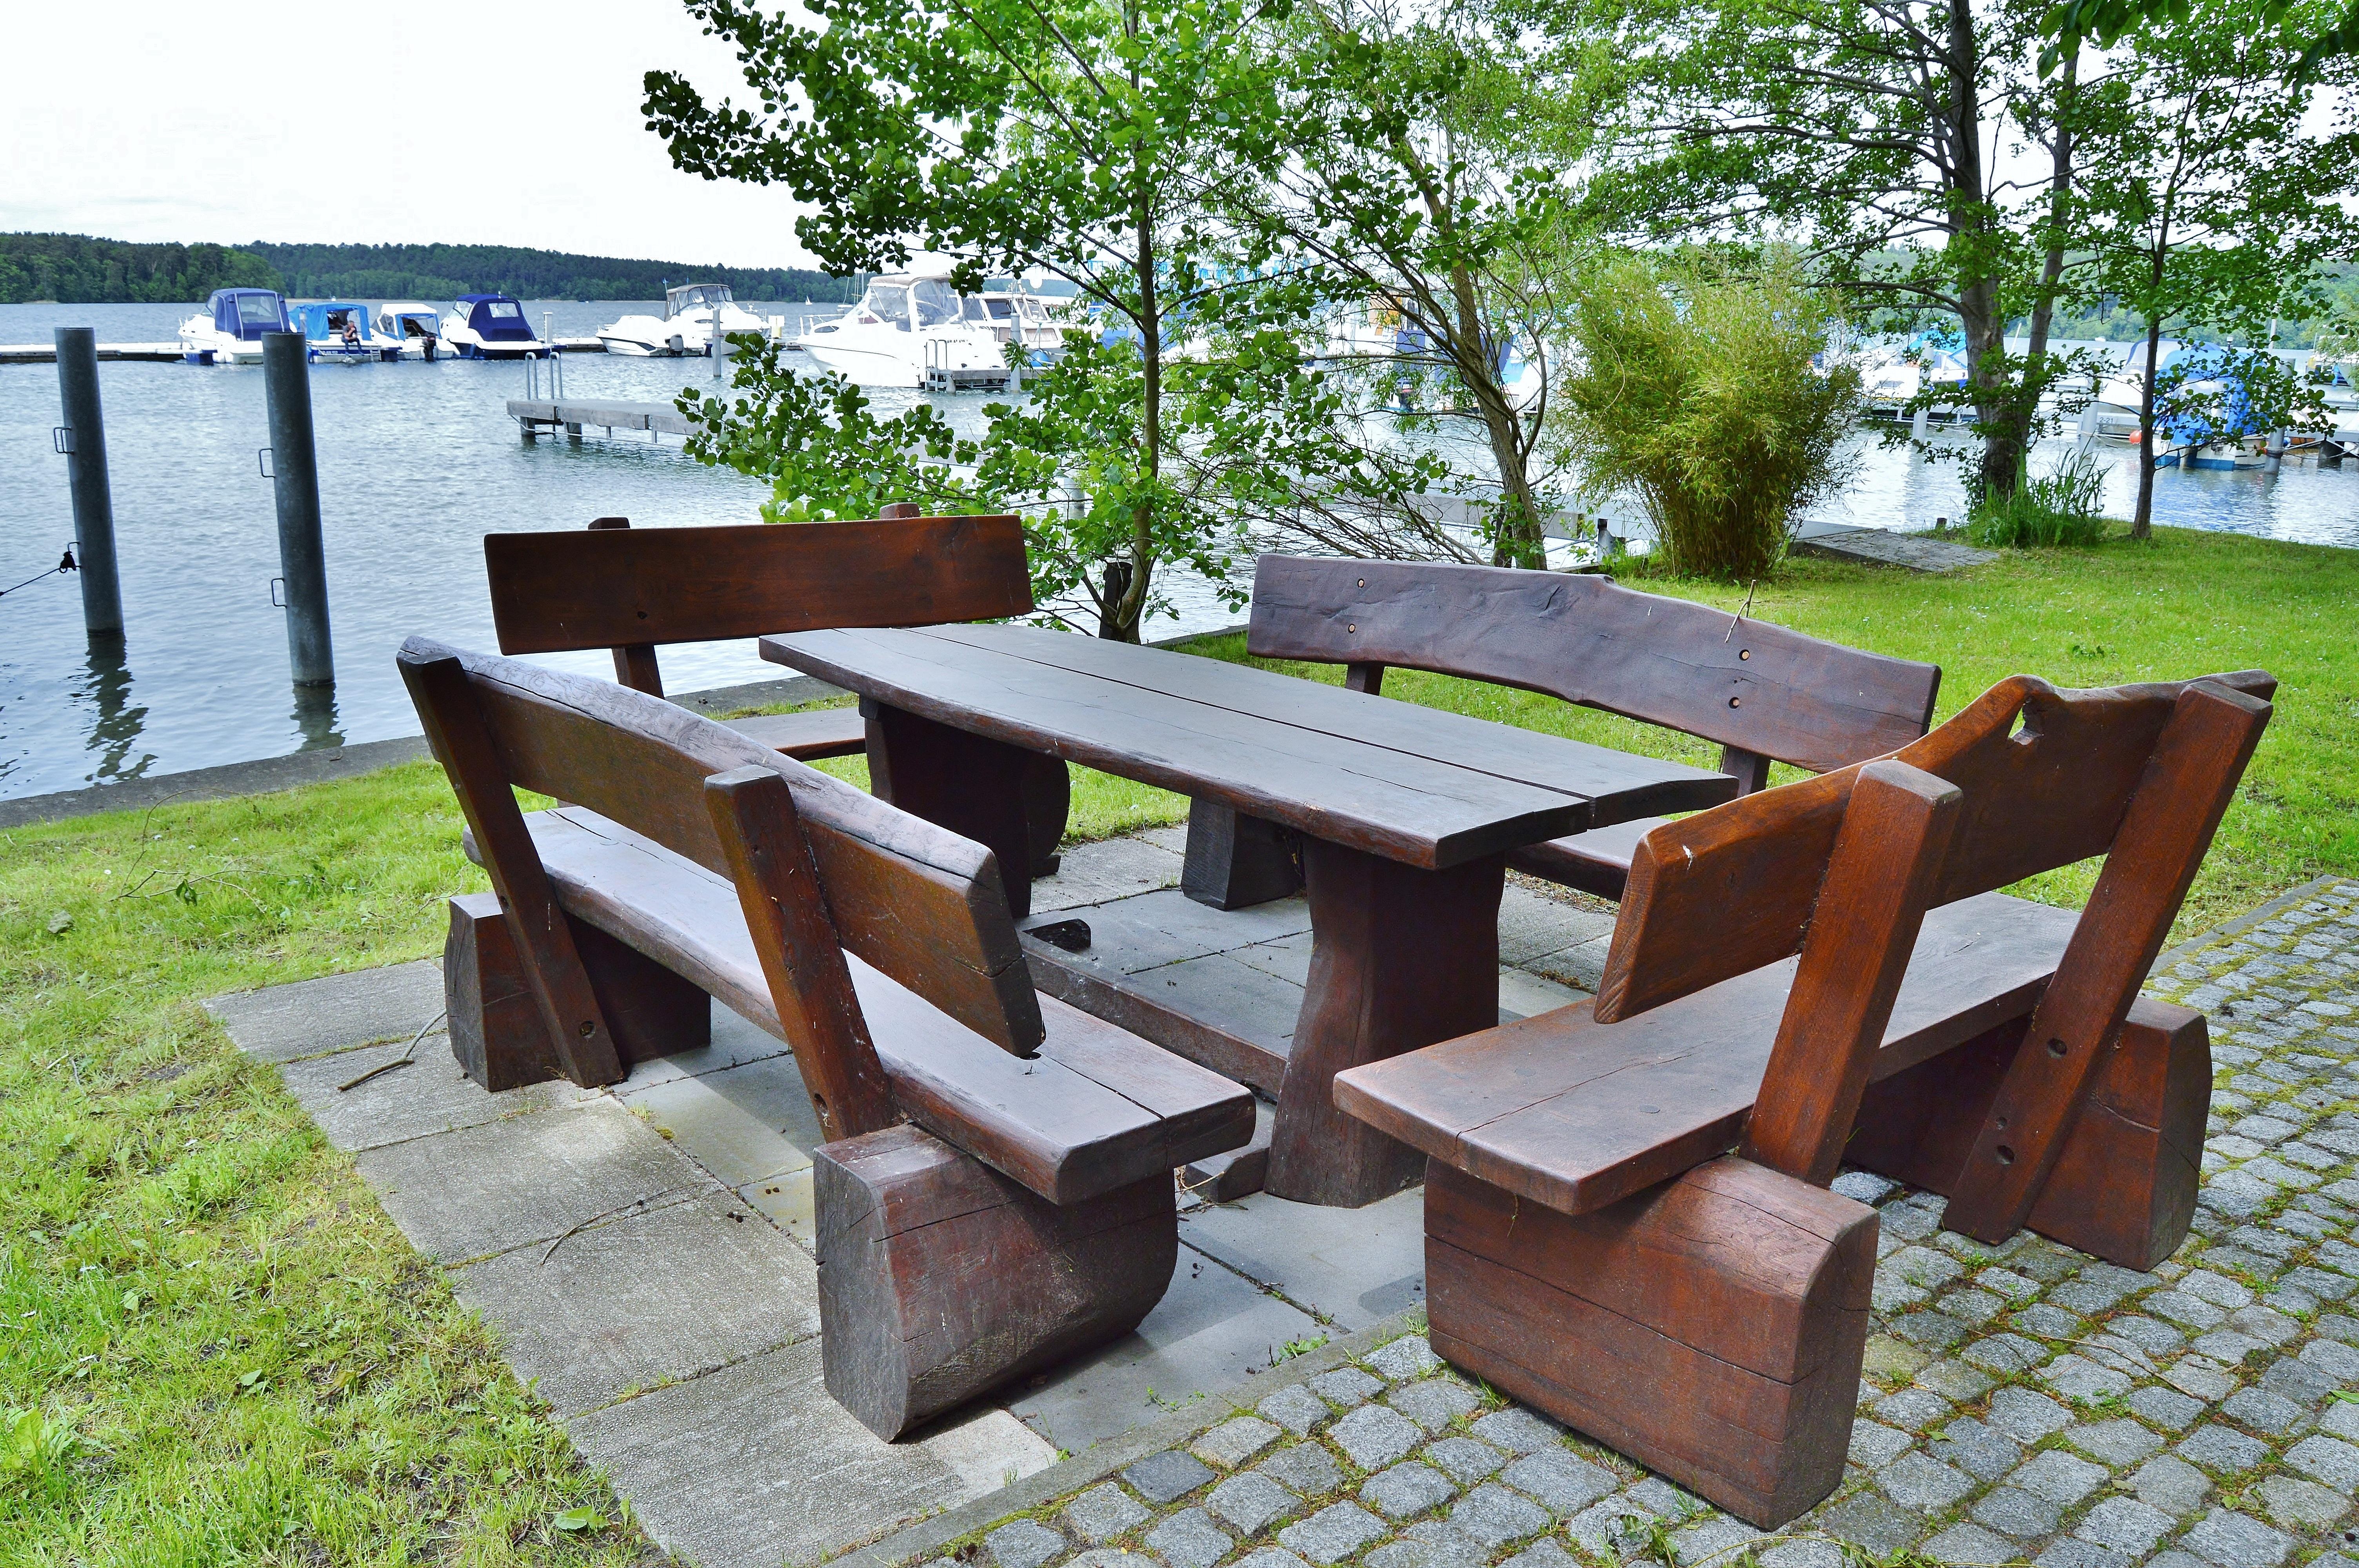 Fotos gratis : mesa, madera, villa, rústico, cabaña, patio interior ...